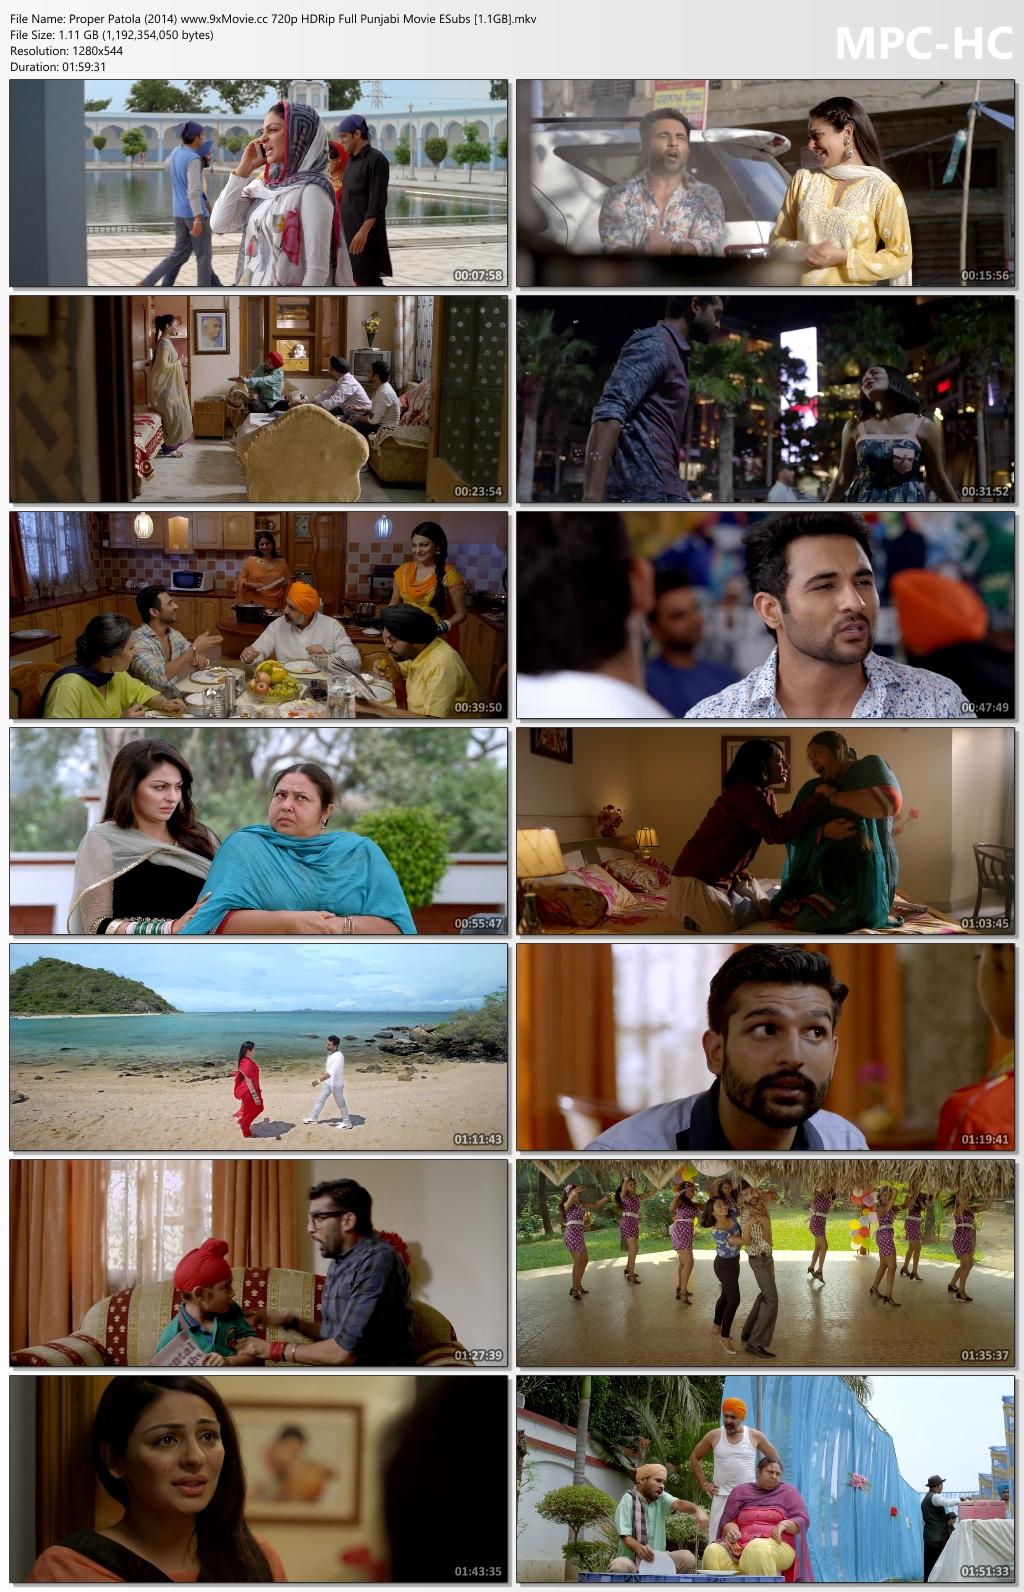 Proper-Patola-2014-www-9x-Movie-cc-720p-HDRip-Full-Punjabi-Movie-ESubs-1-1-GB-mkv